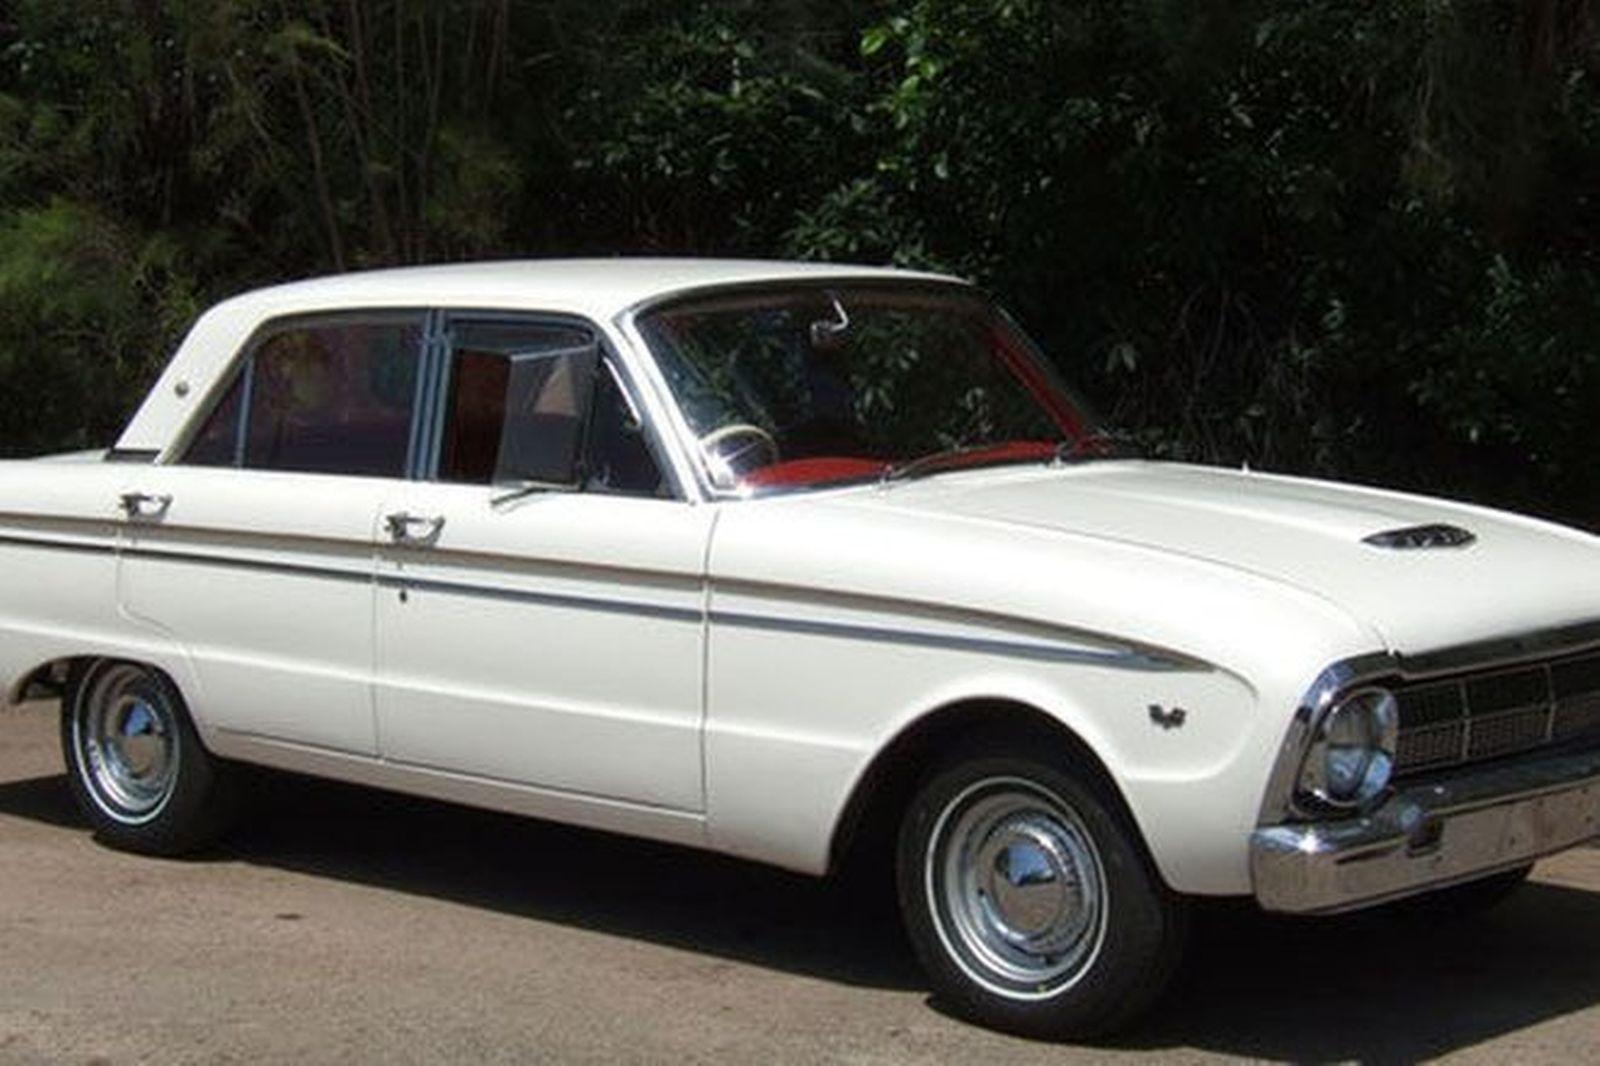 1964 ford falcon 4 door find used 1964 ford falcon 4 door 170 special - Ford Xm Falcon Futura Sedan